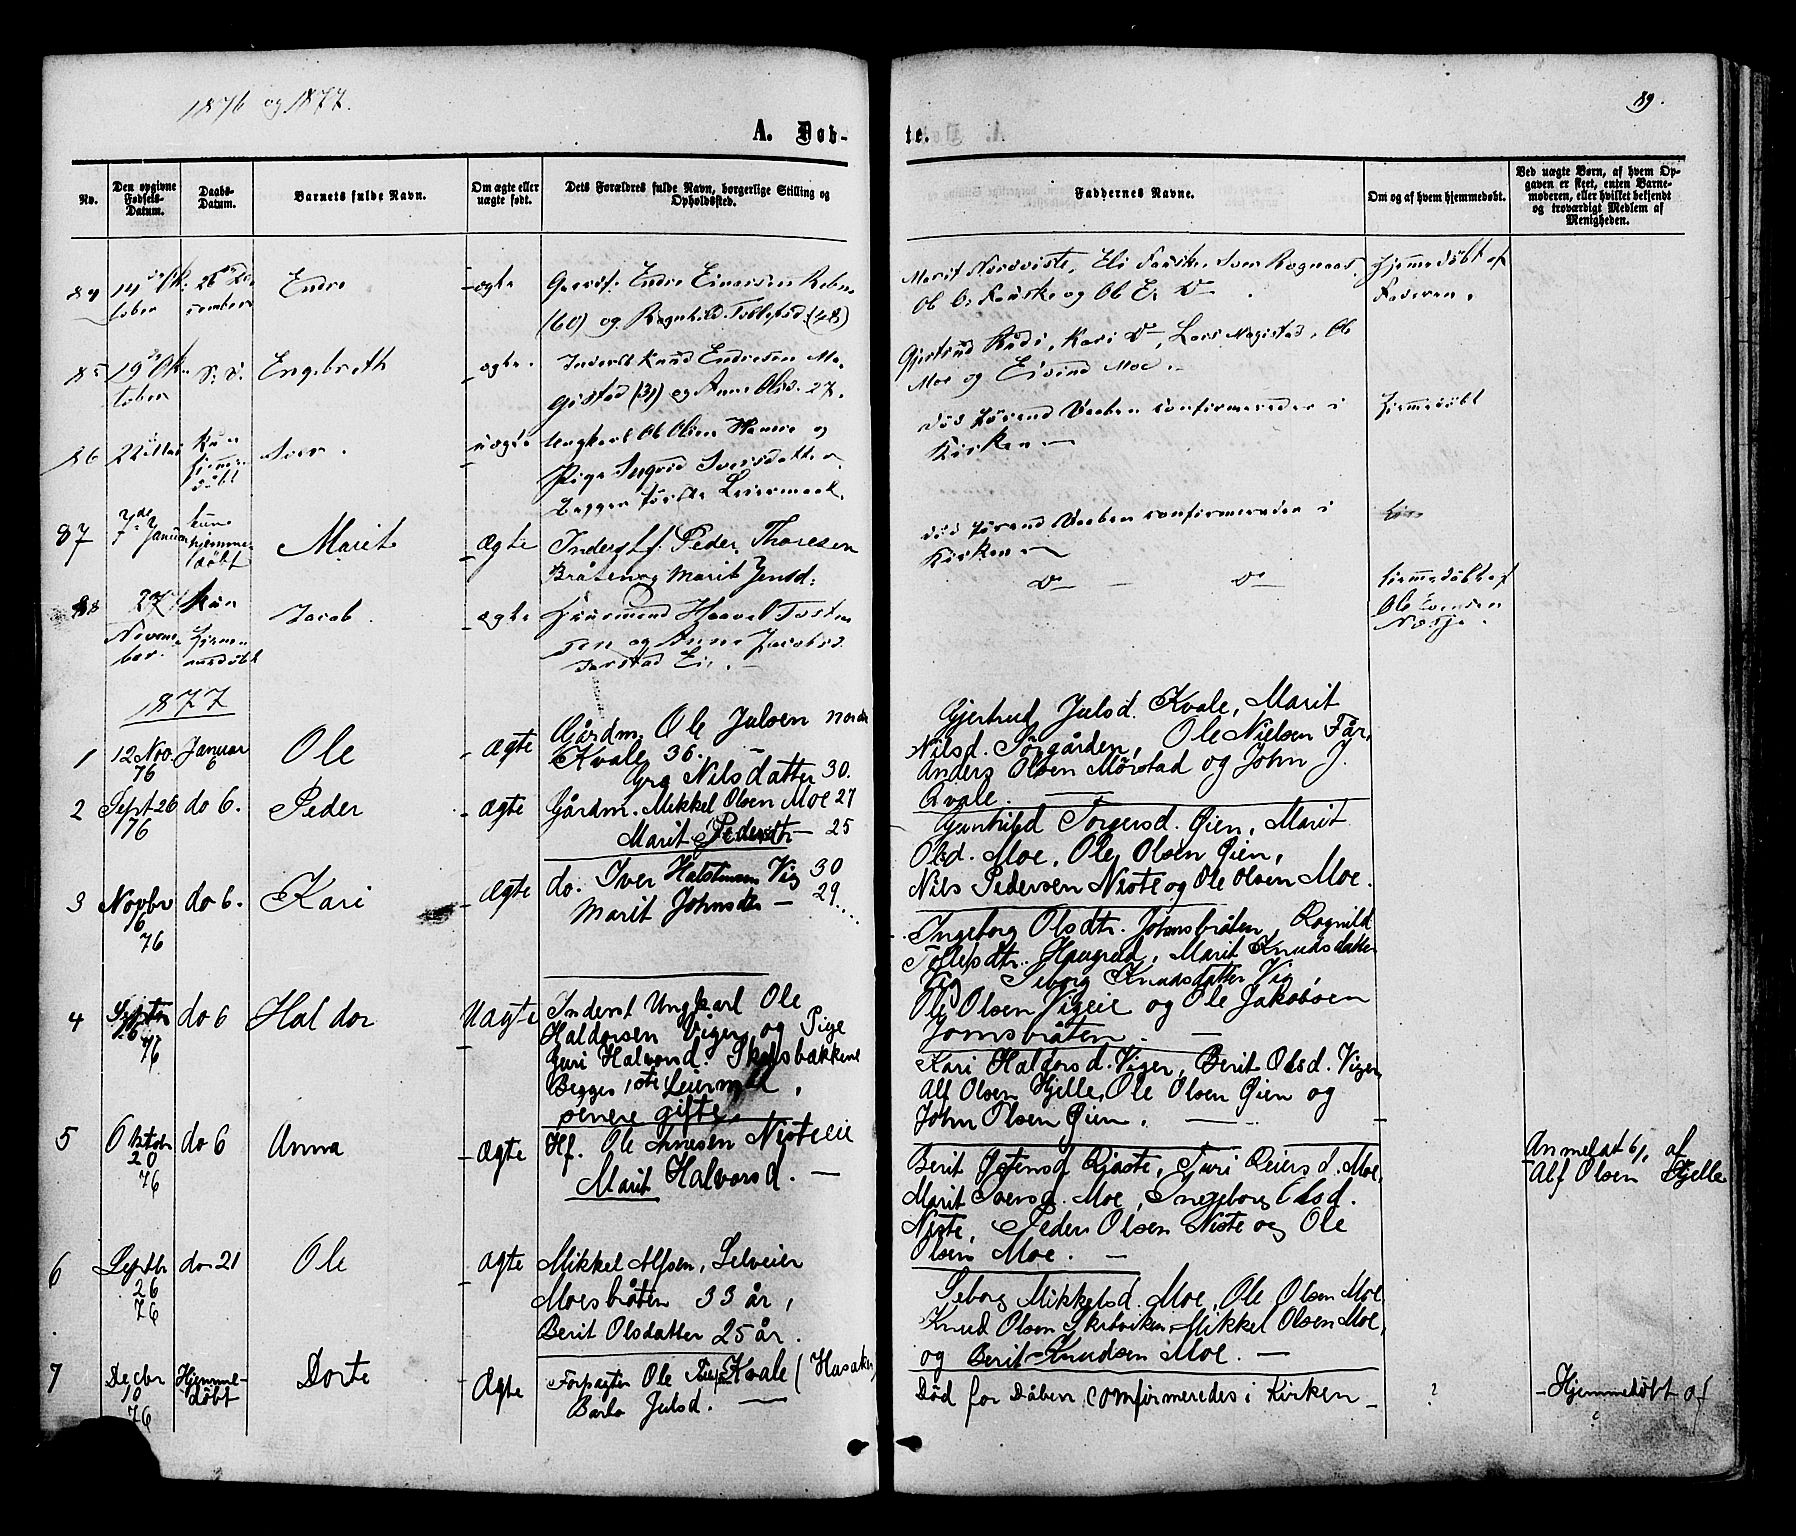 SAH, Vestre Slidre prestekontor, Ministerialbok nr. 3, 1865-1880, s. 89